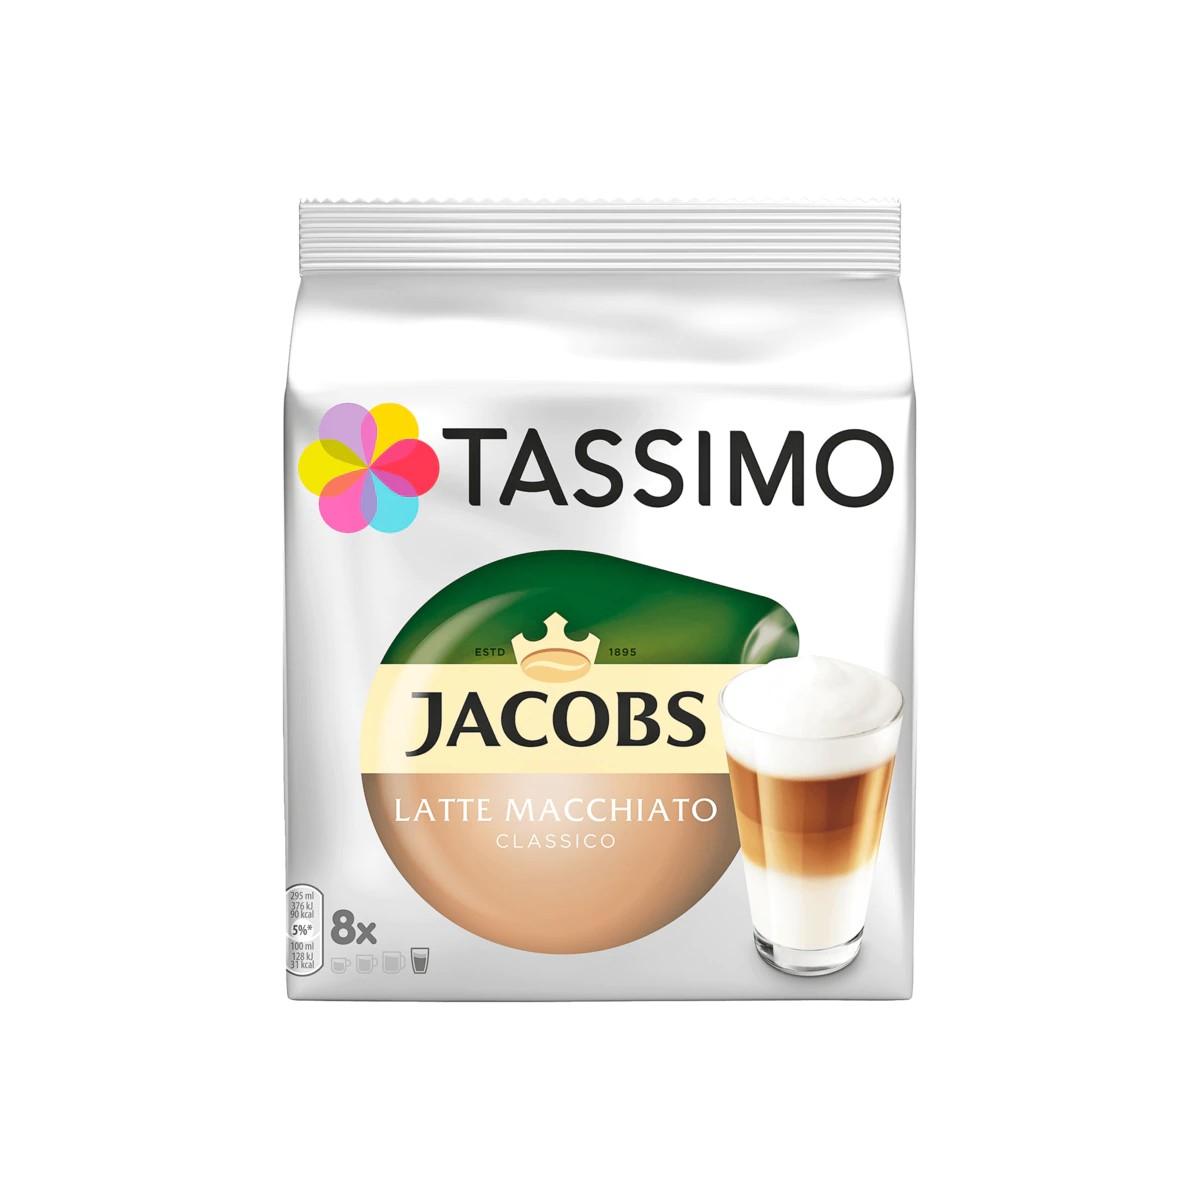 Tassimo Kaffeekapseln Jacobs Latte Macchiato Classico